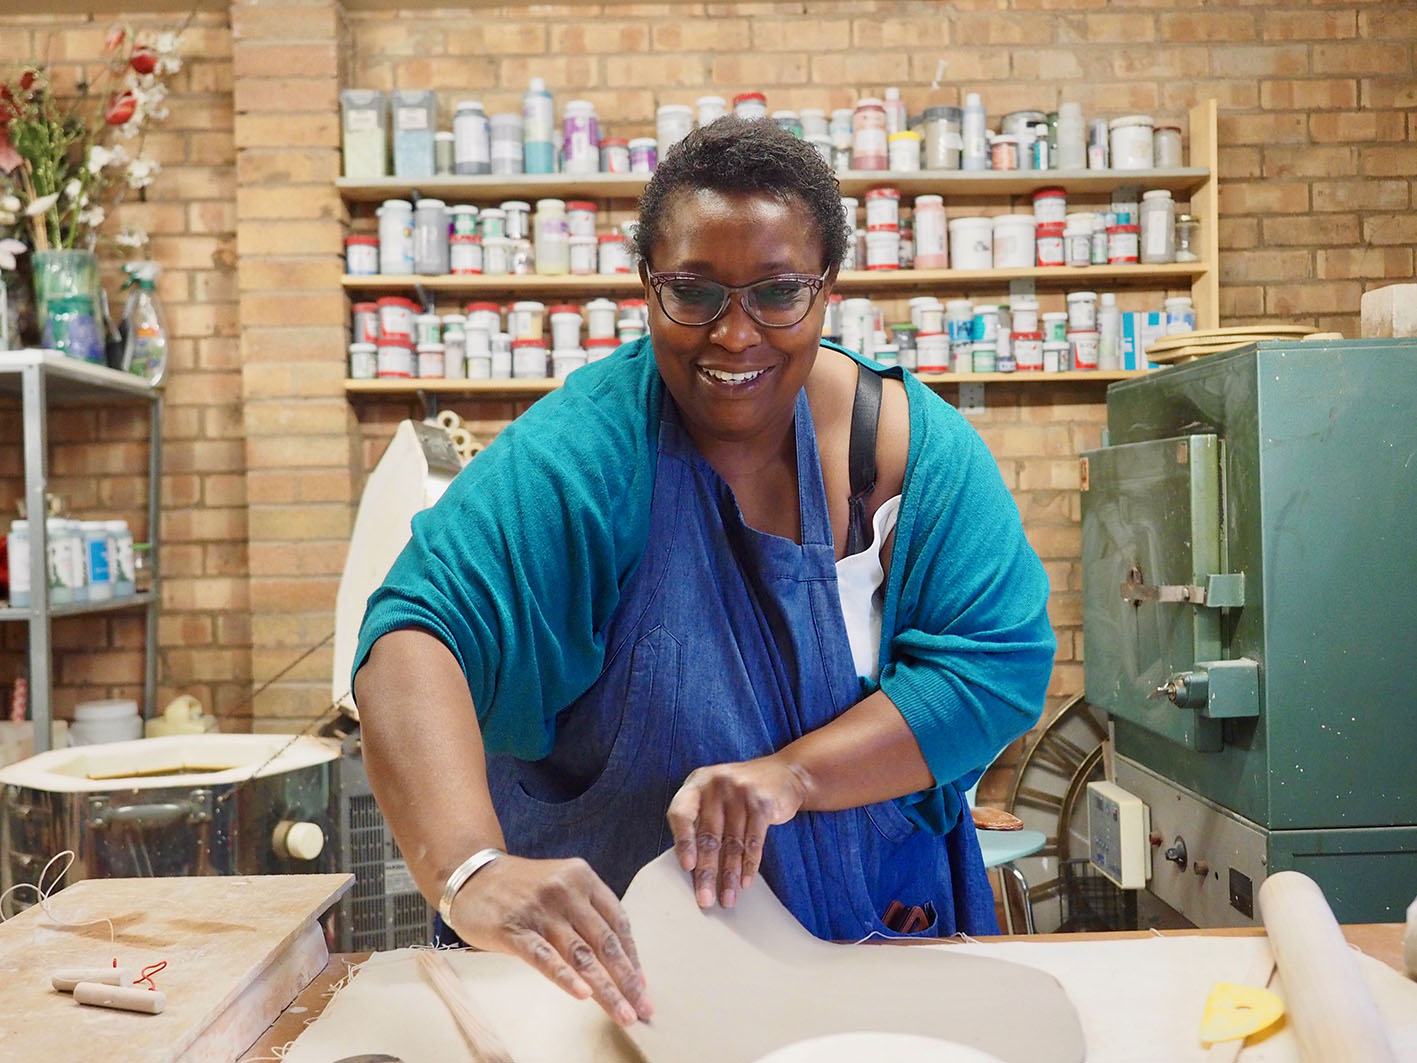 Mandy Sterling Elemental Ceramics interviewed for The Homeworker